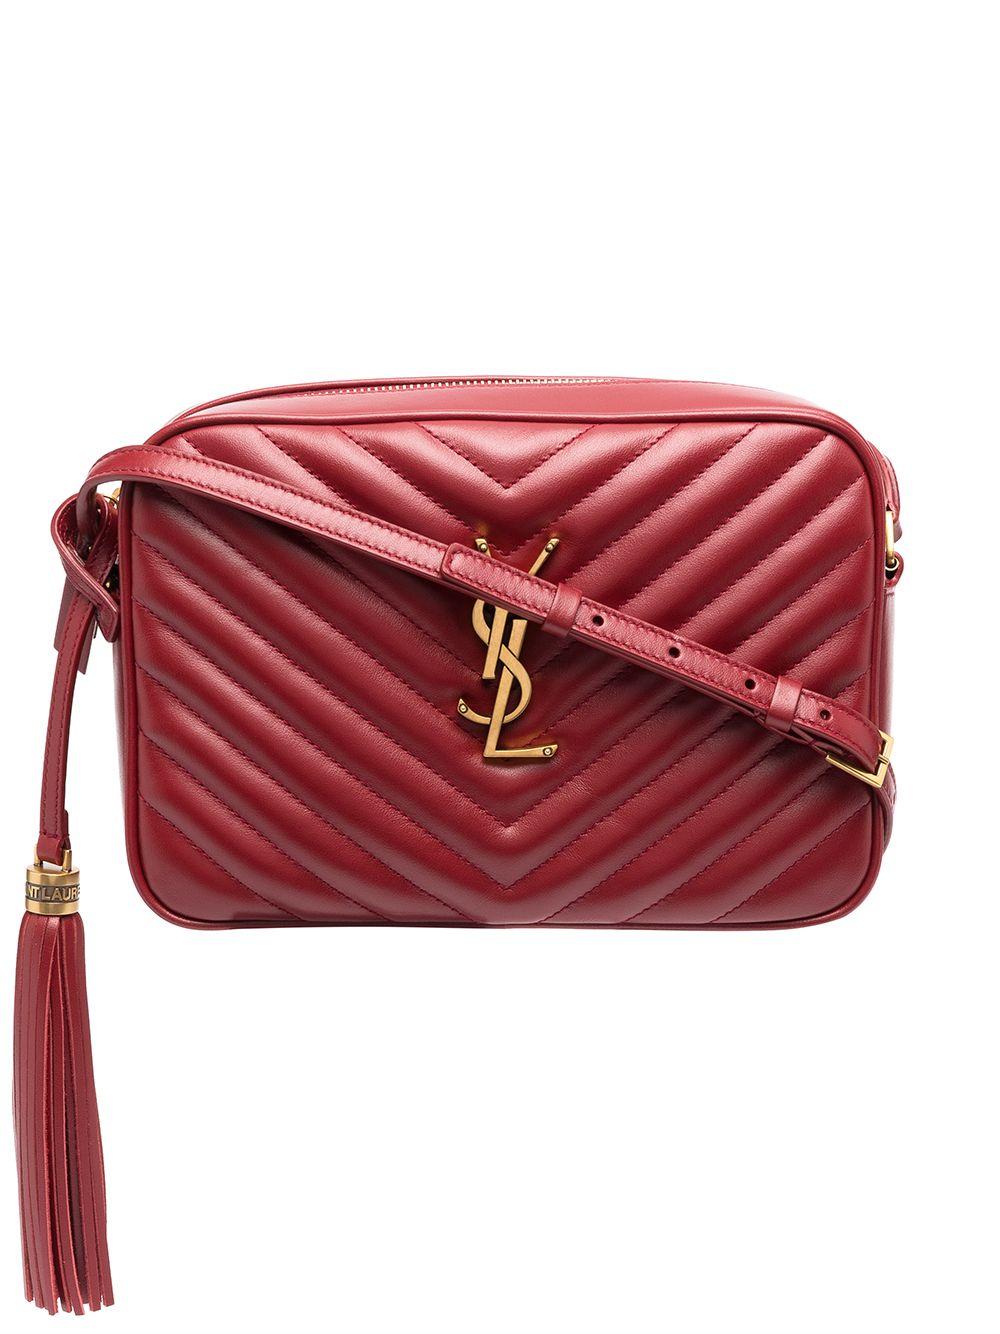 Monogram Lou Leather Camera Bag